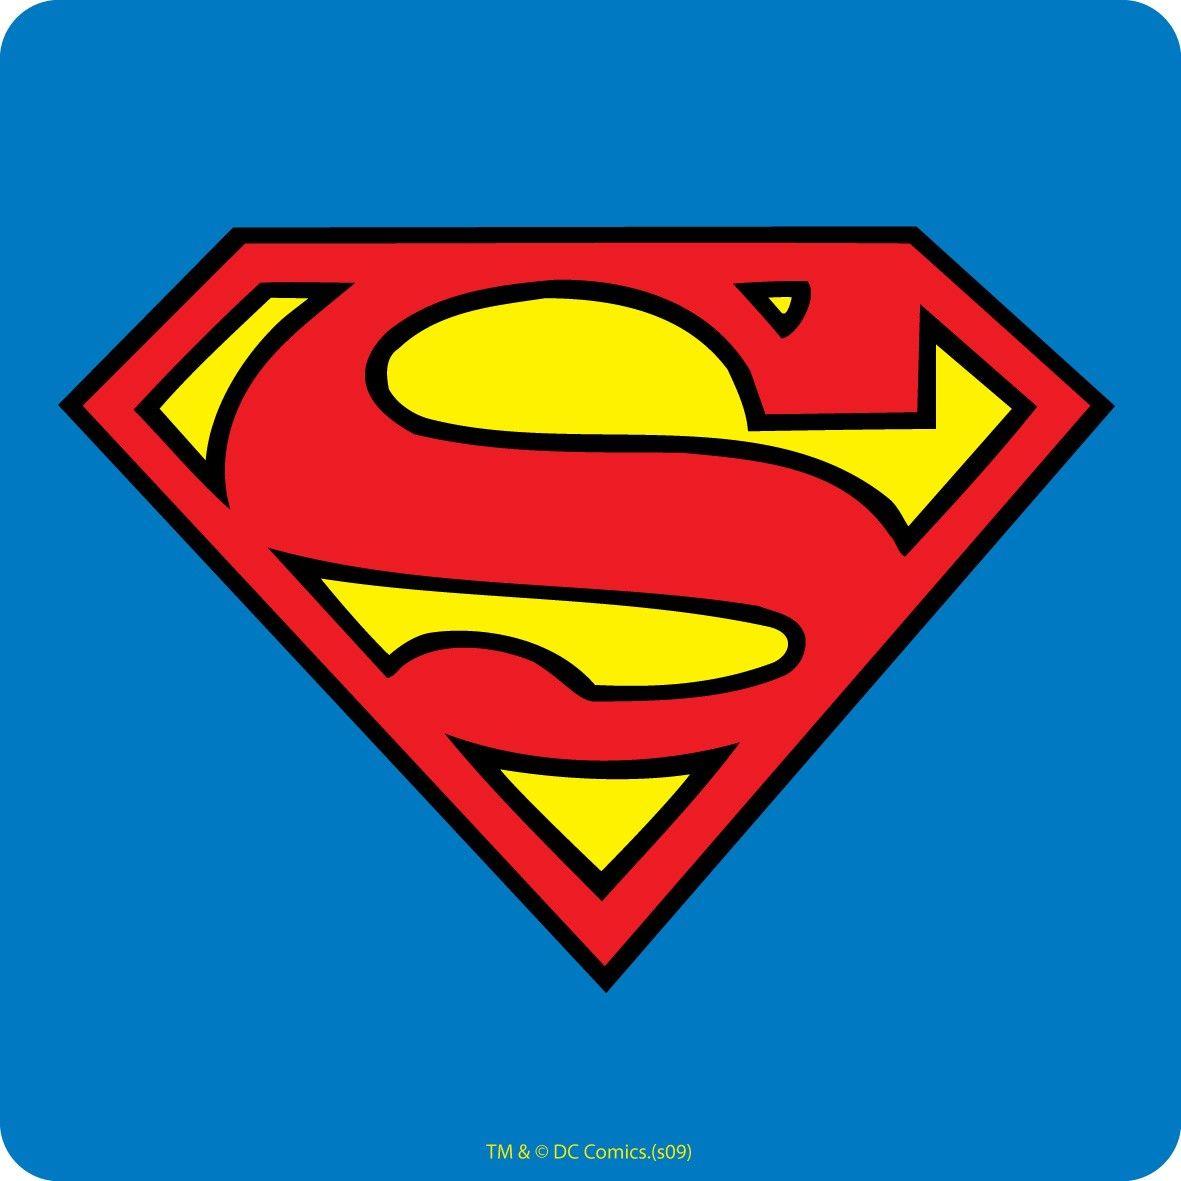 superman logo - Google Search | emblems | Pinterest